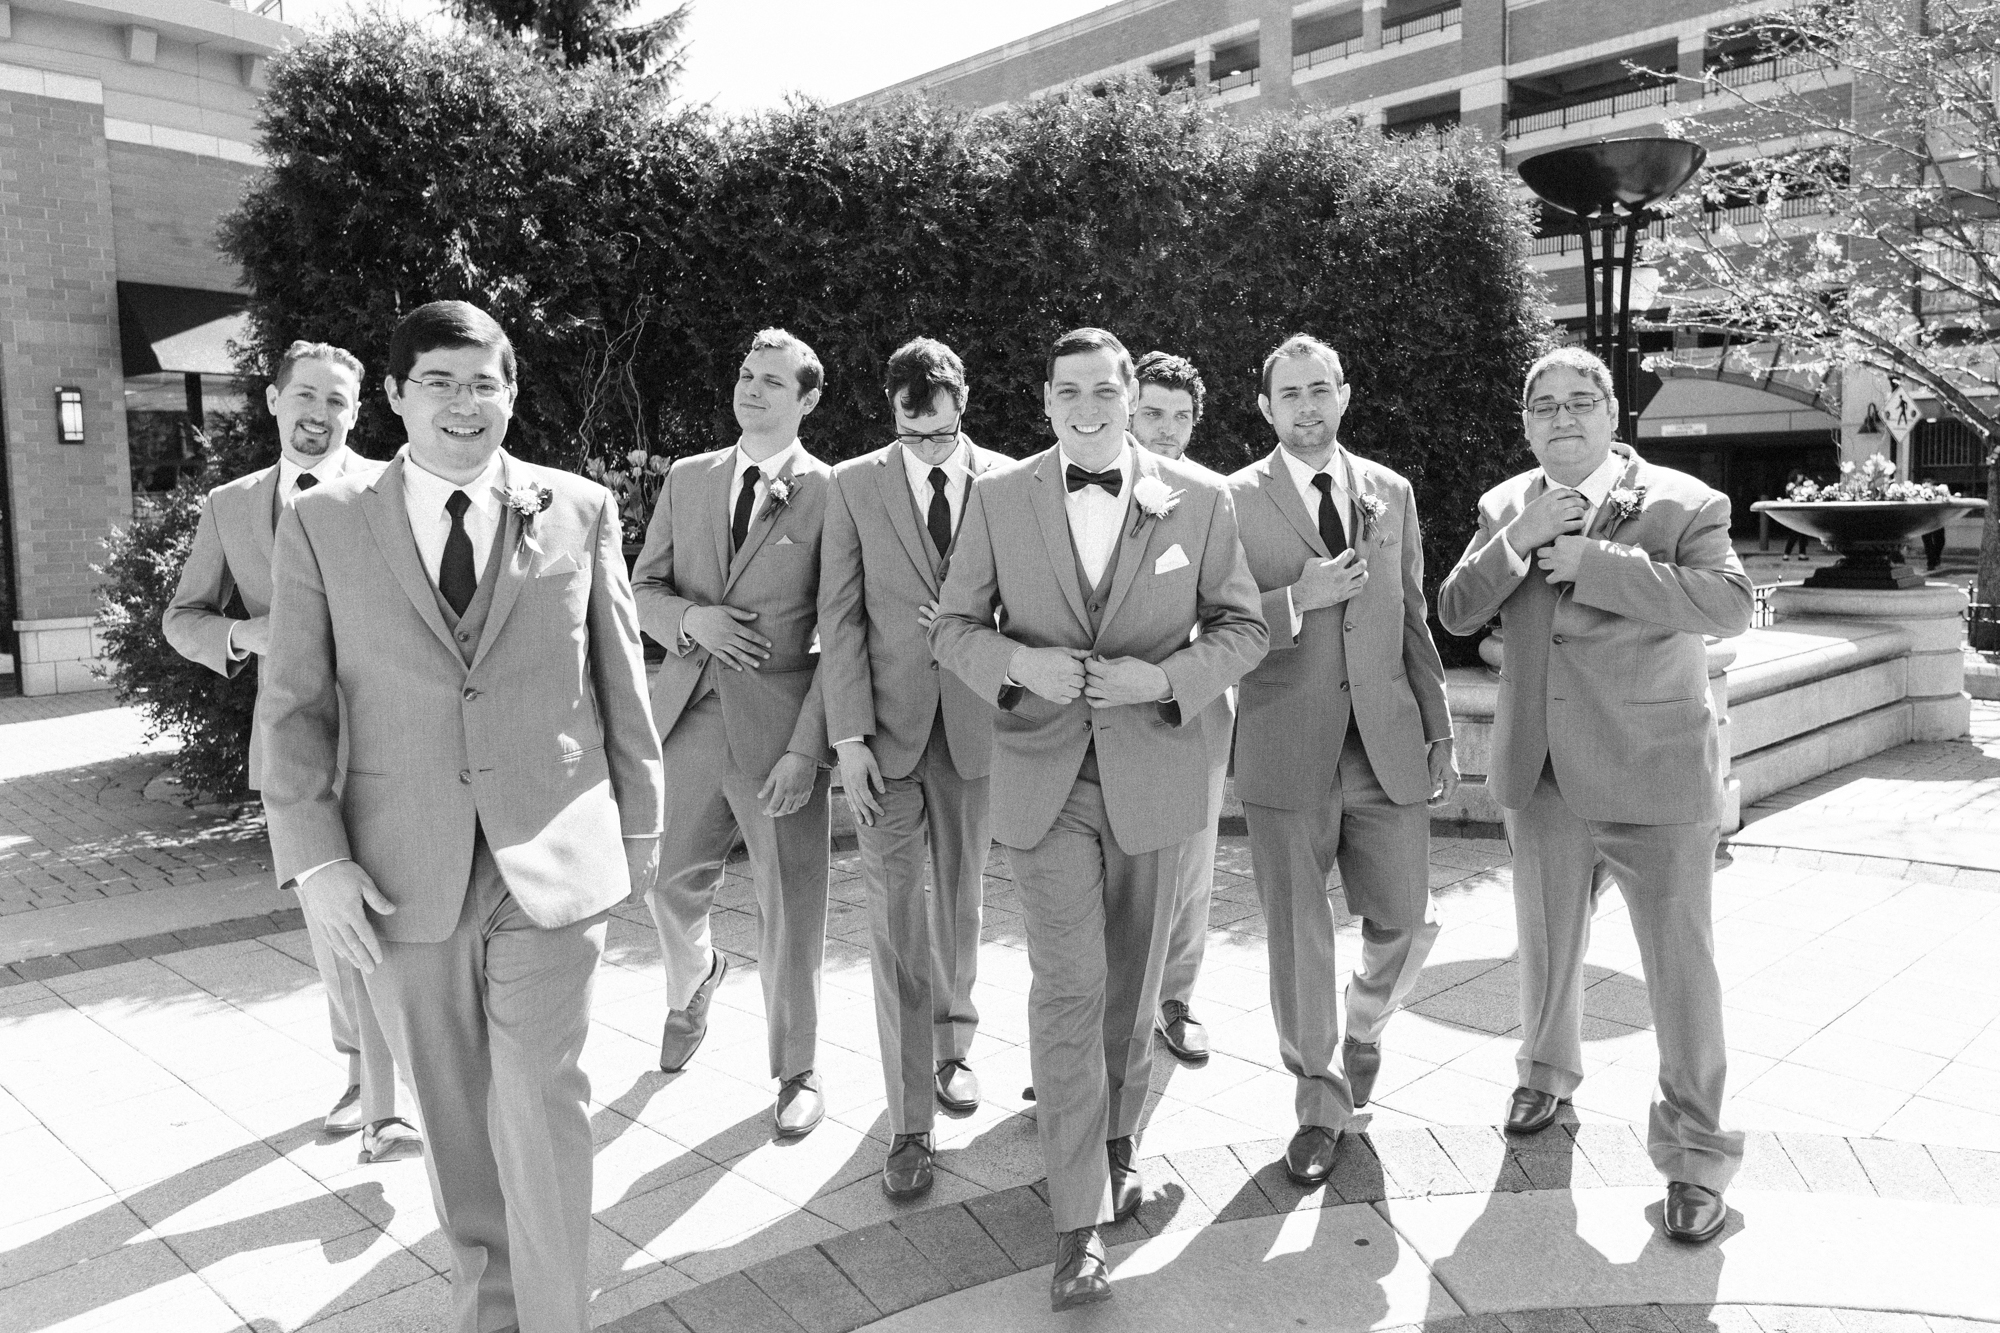 arlington-heights-wedding-jessica-matthew-20451